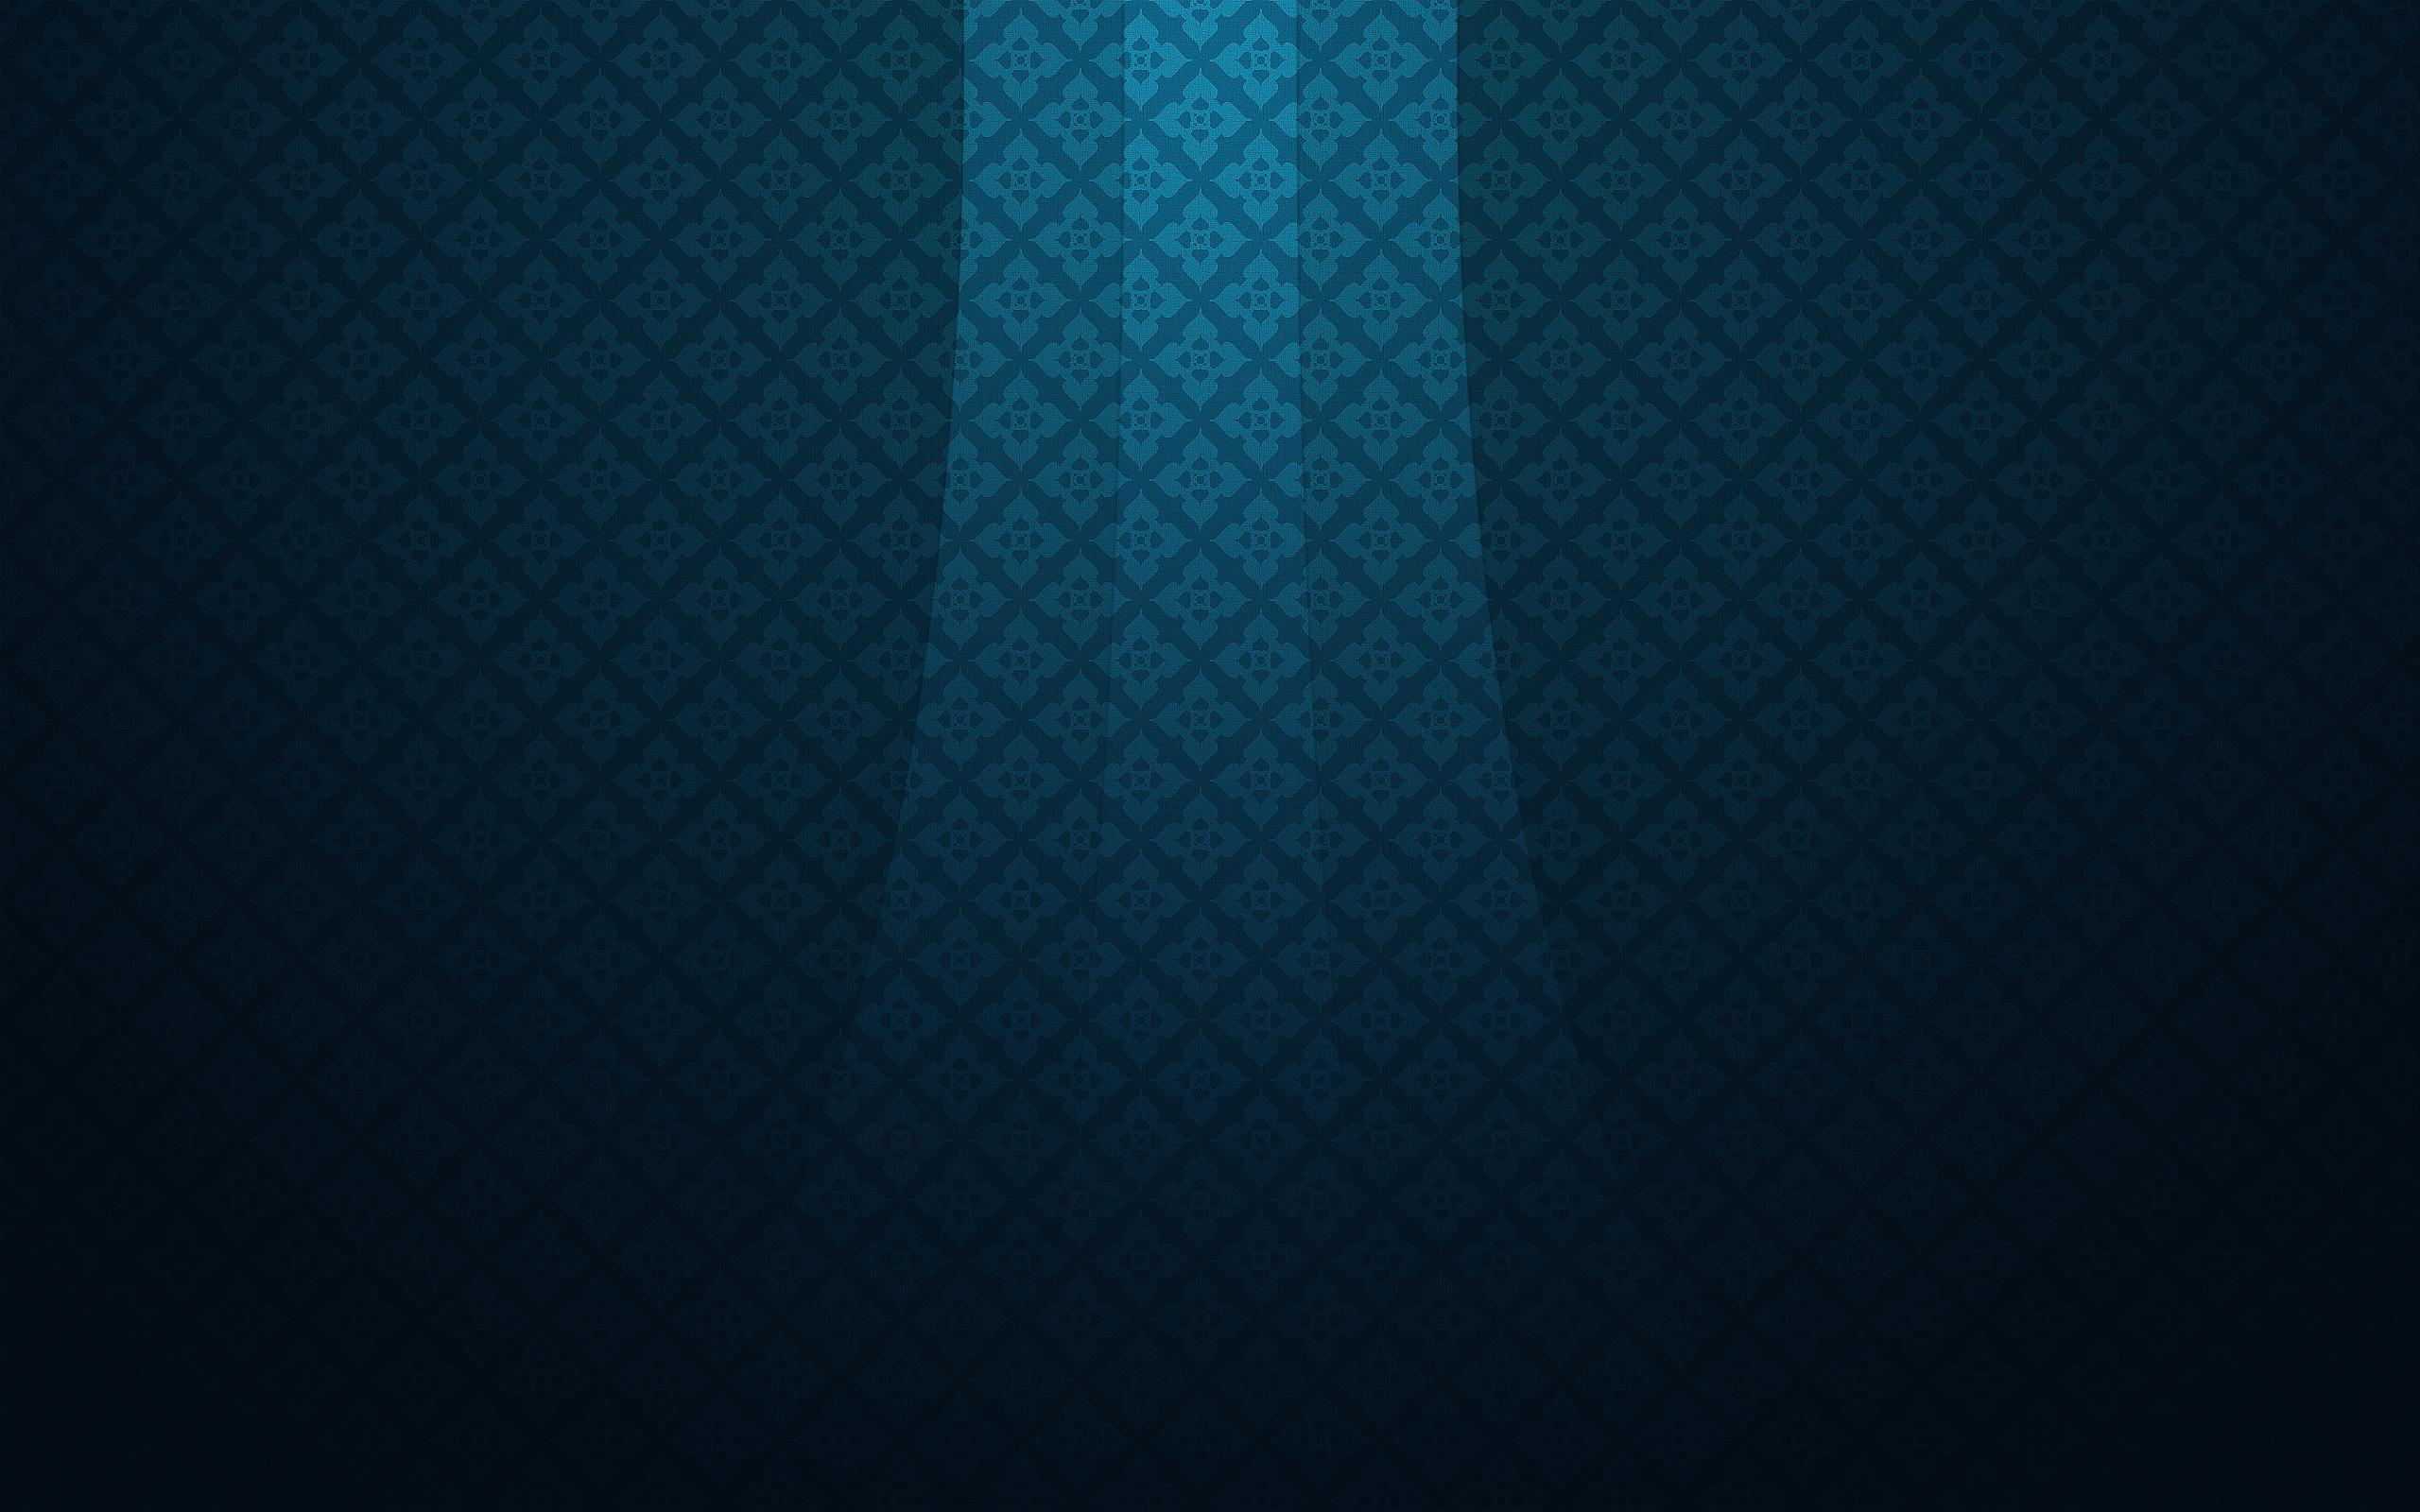 Pattern - Wallpaper  Wallpaper